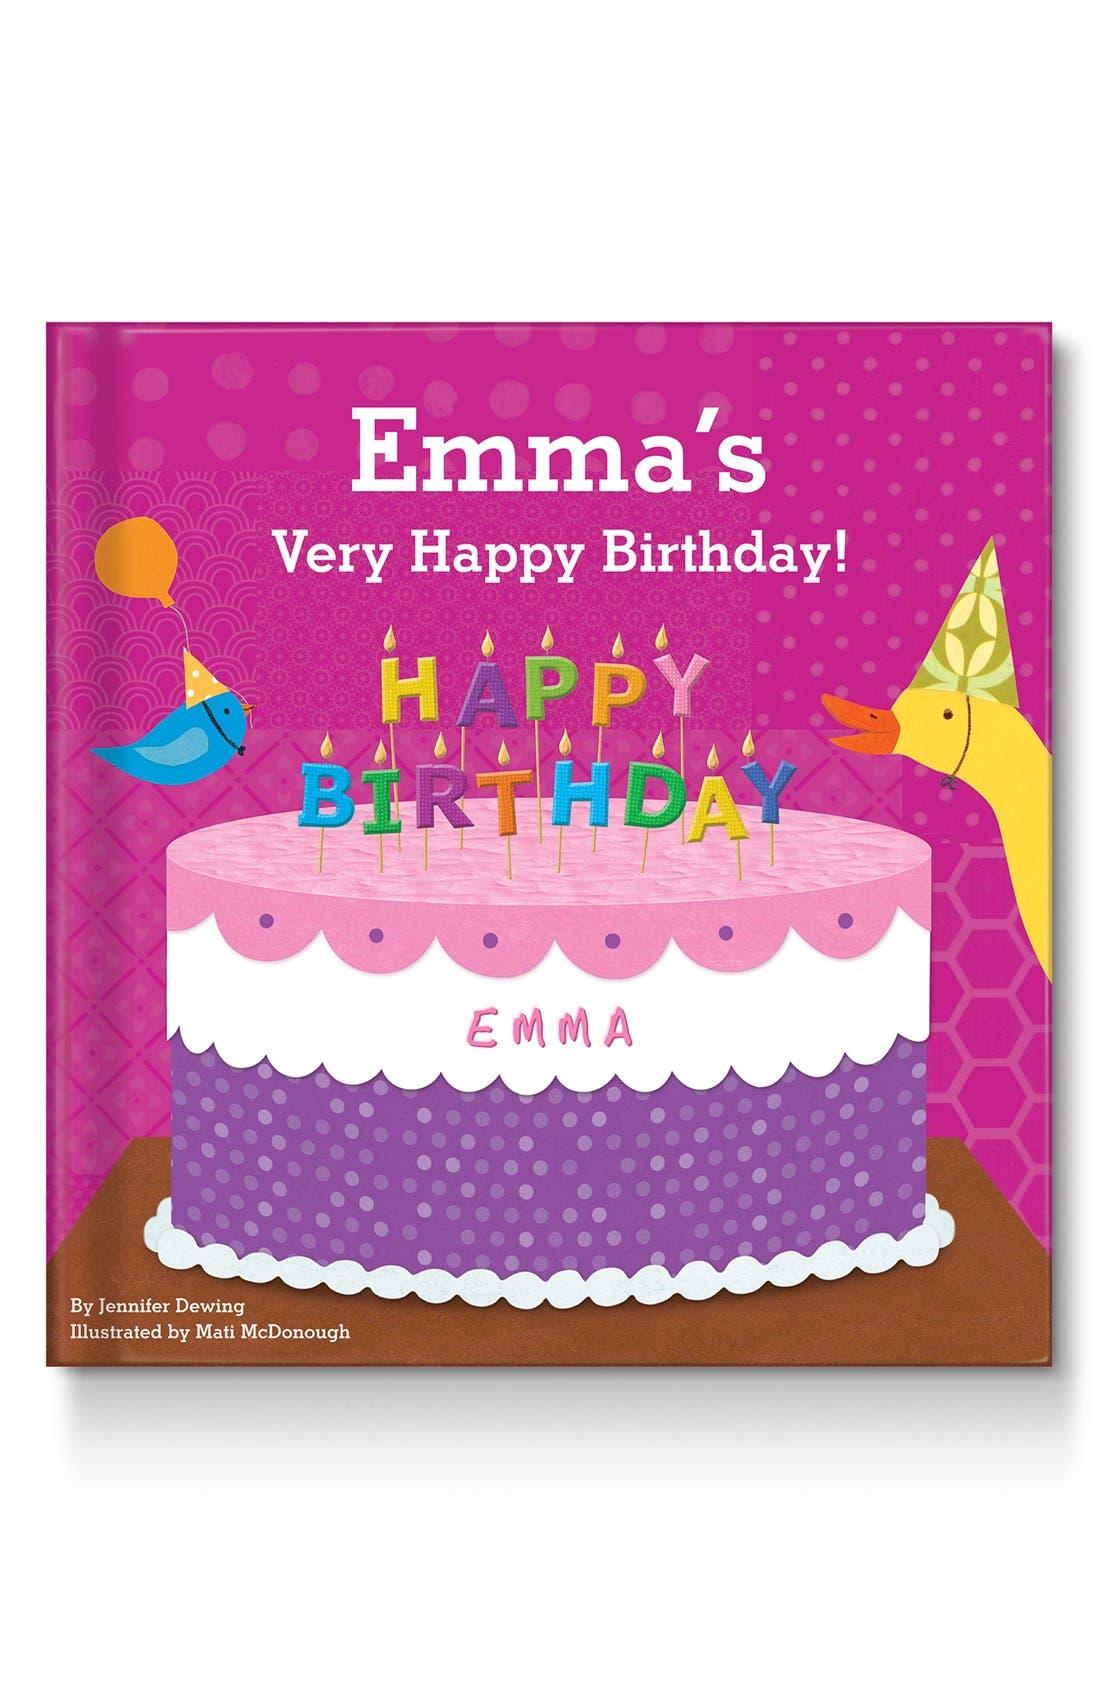 'My Very Happy Birthday' Personalized Book